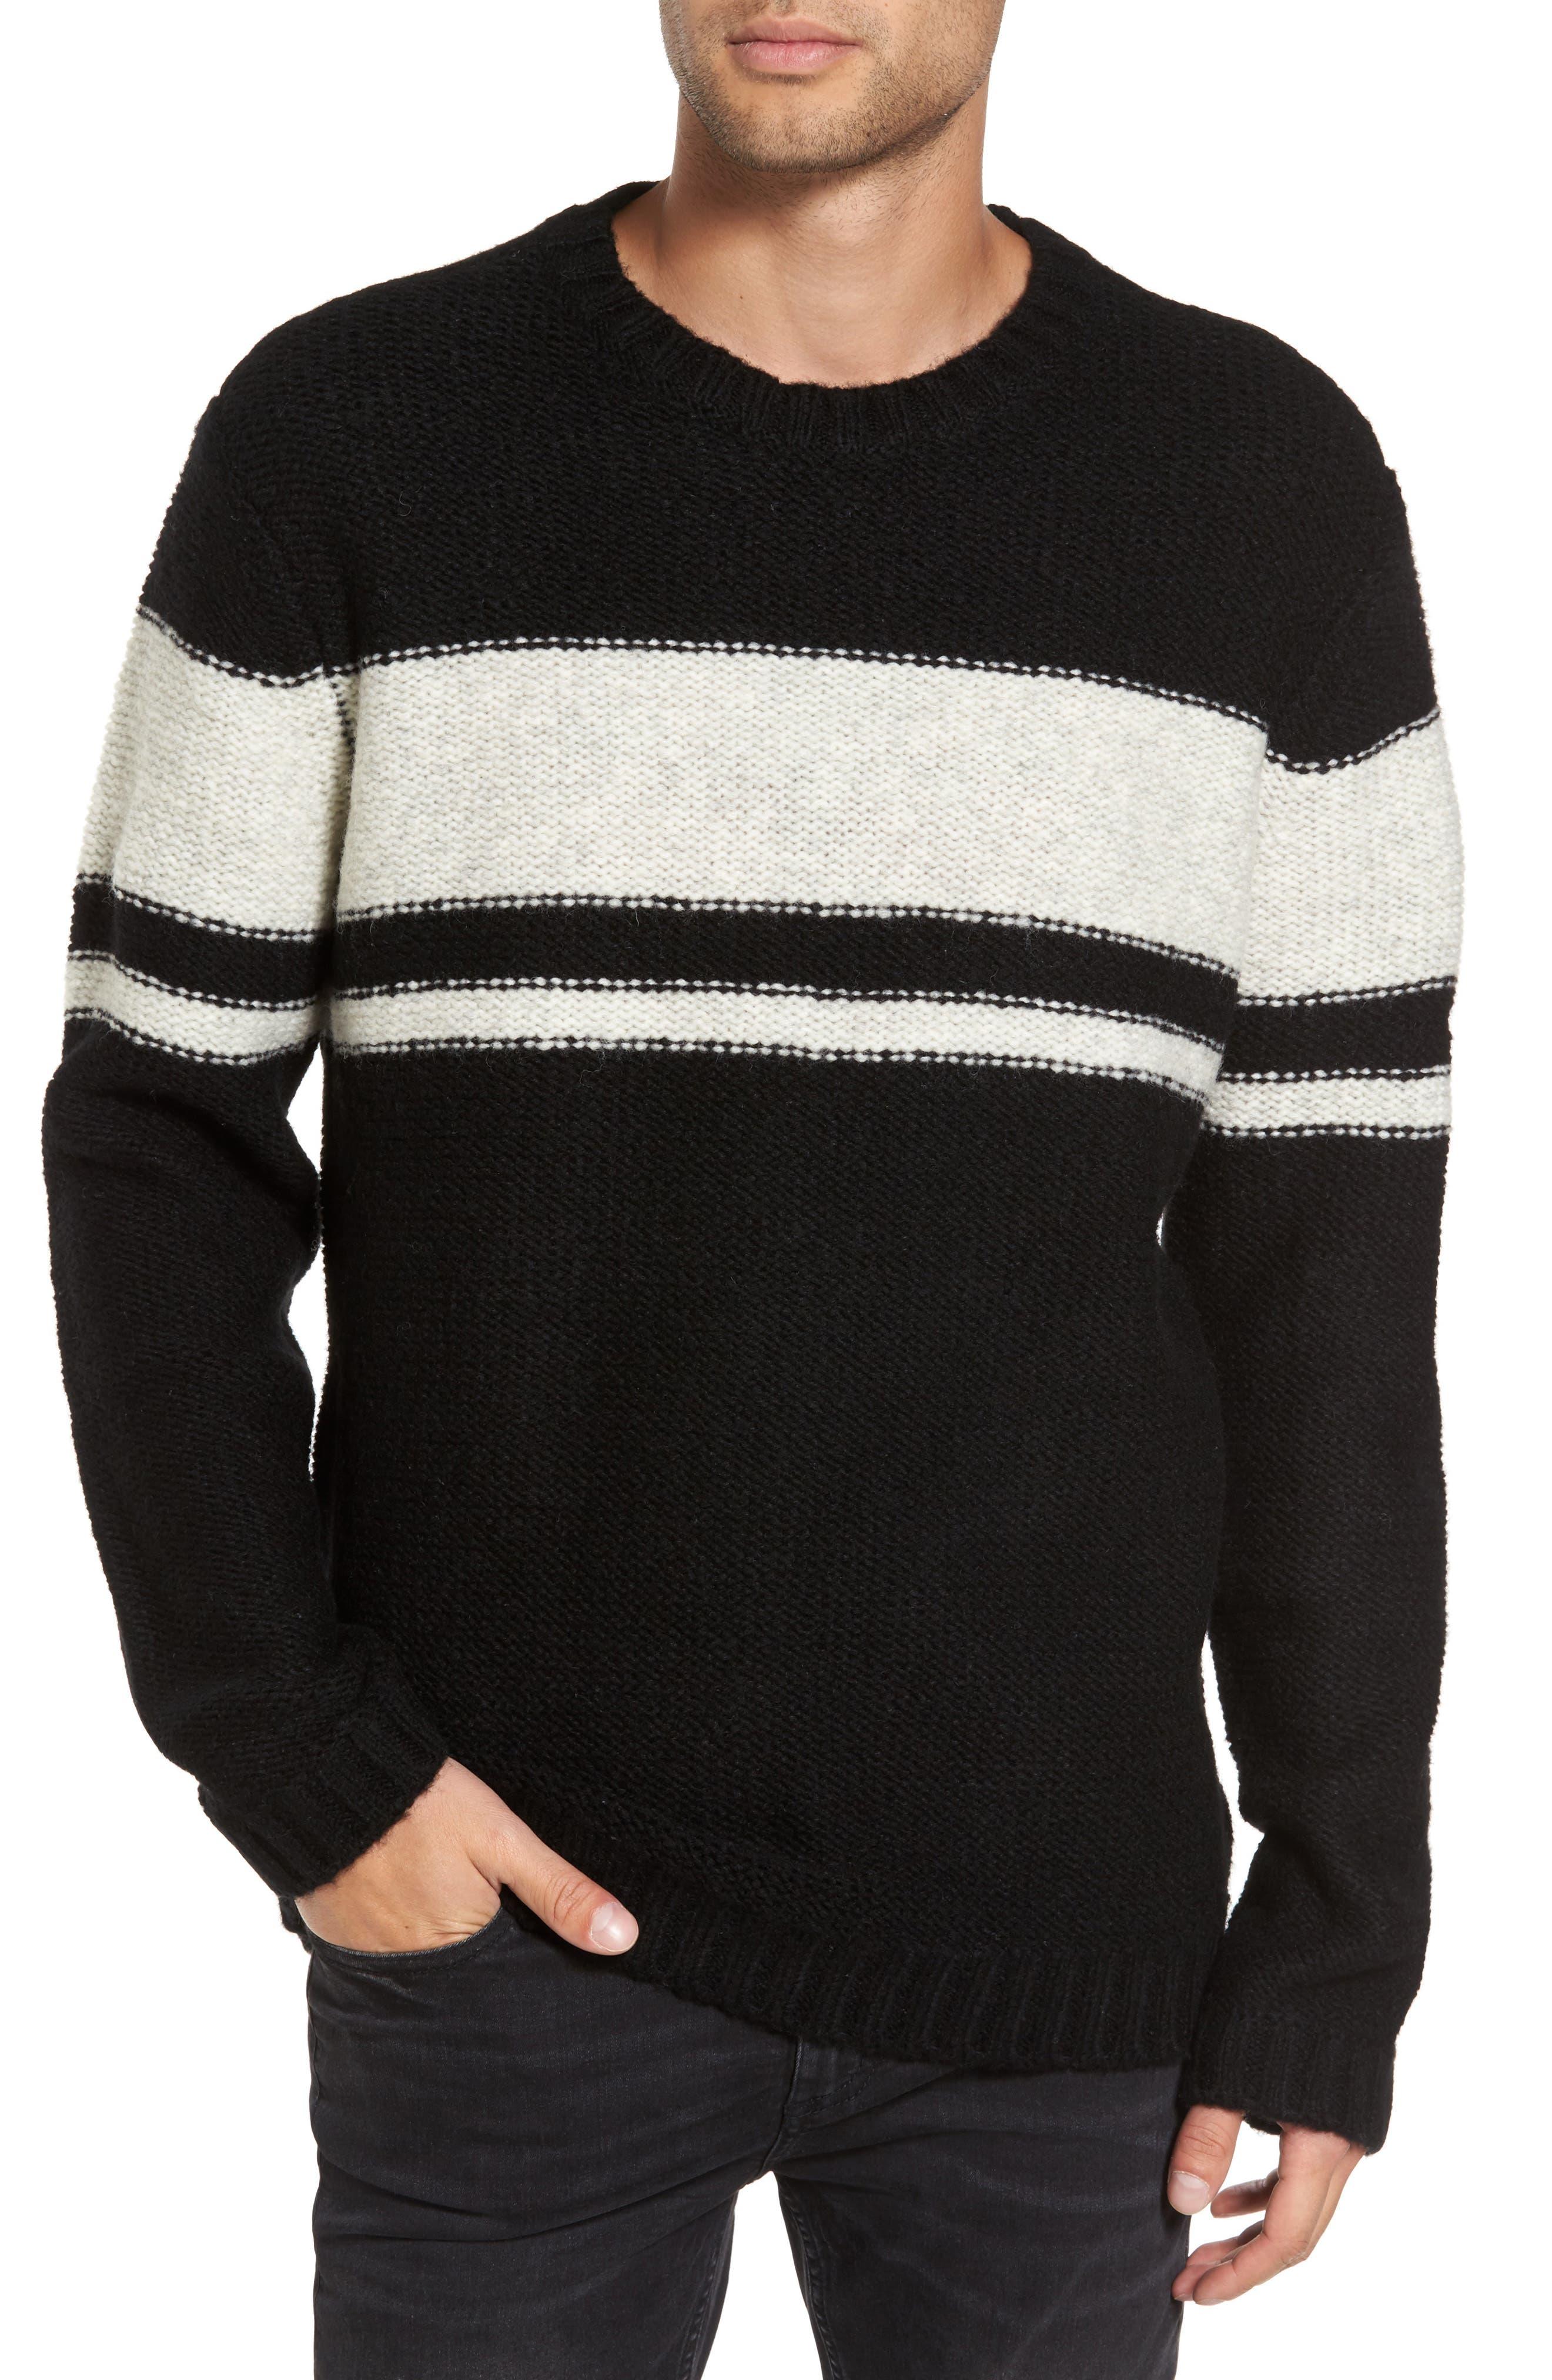 Blume Sweater,                         Main,                         color, 001